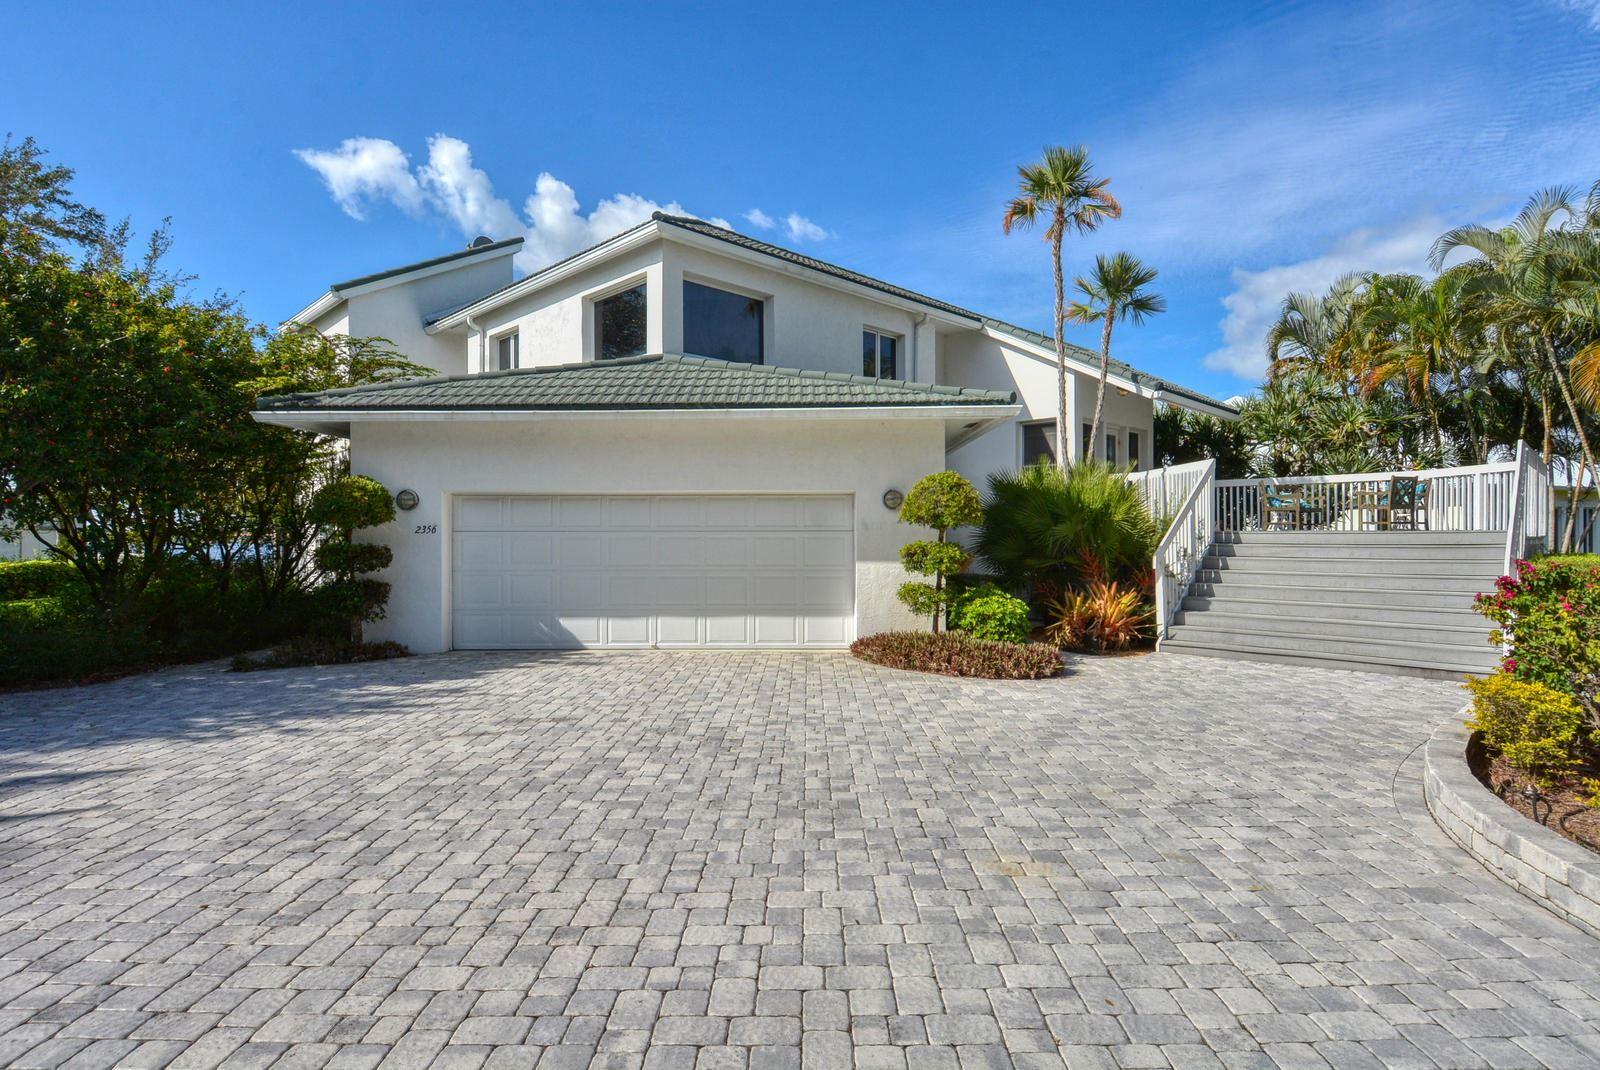 2356 NW Cove View View, Stuart, FL 34994 - #: RX-10607355